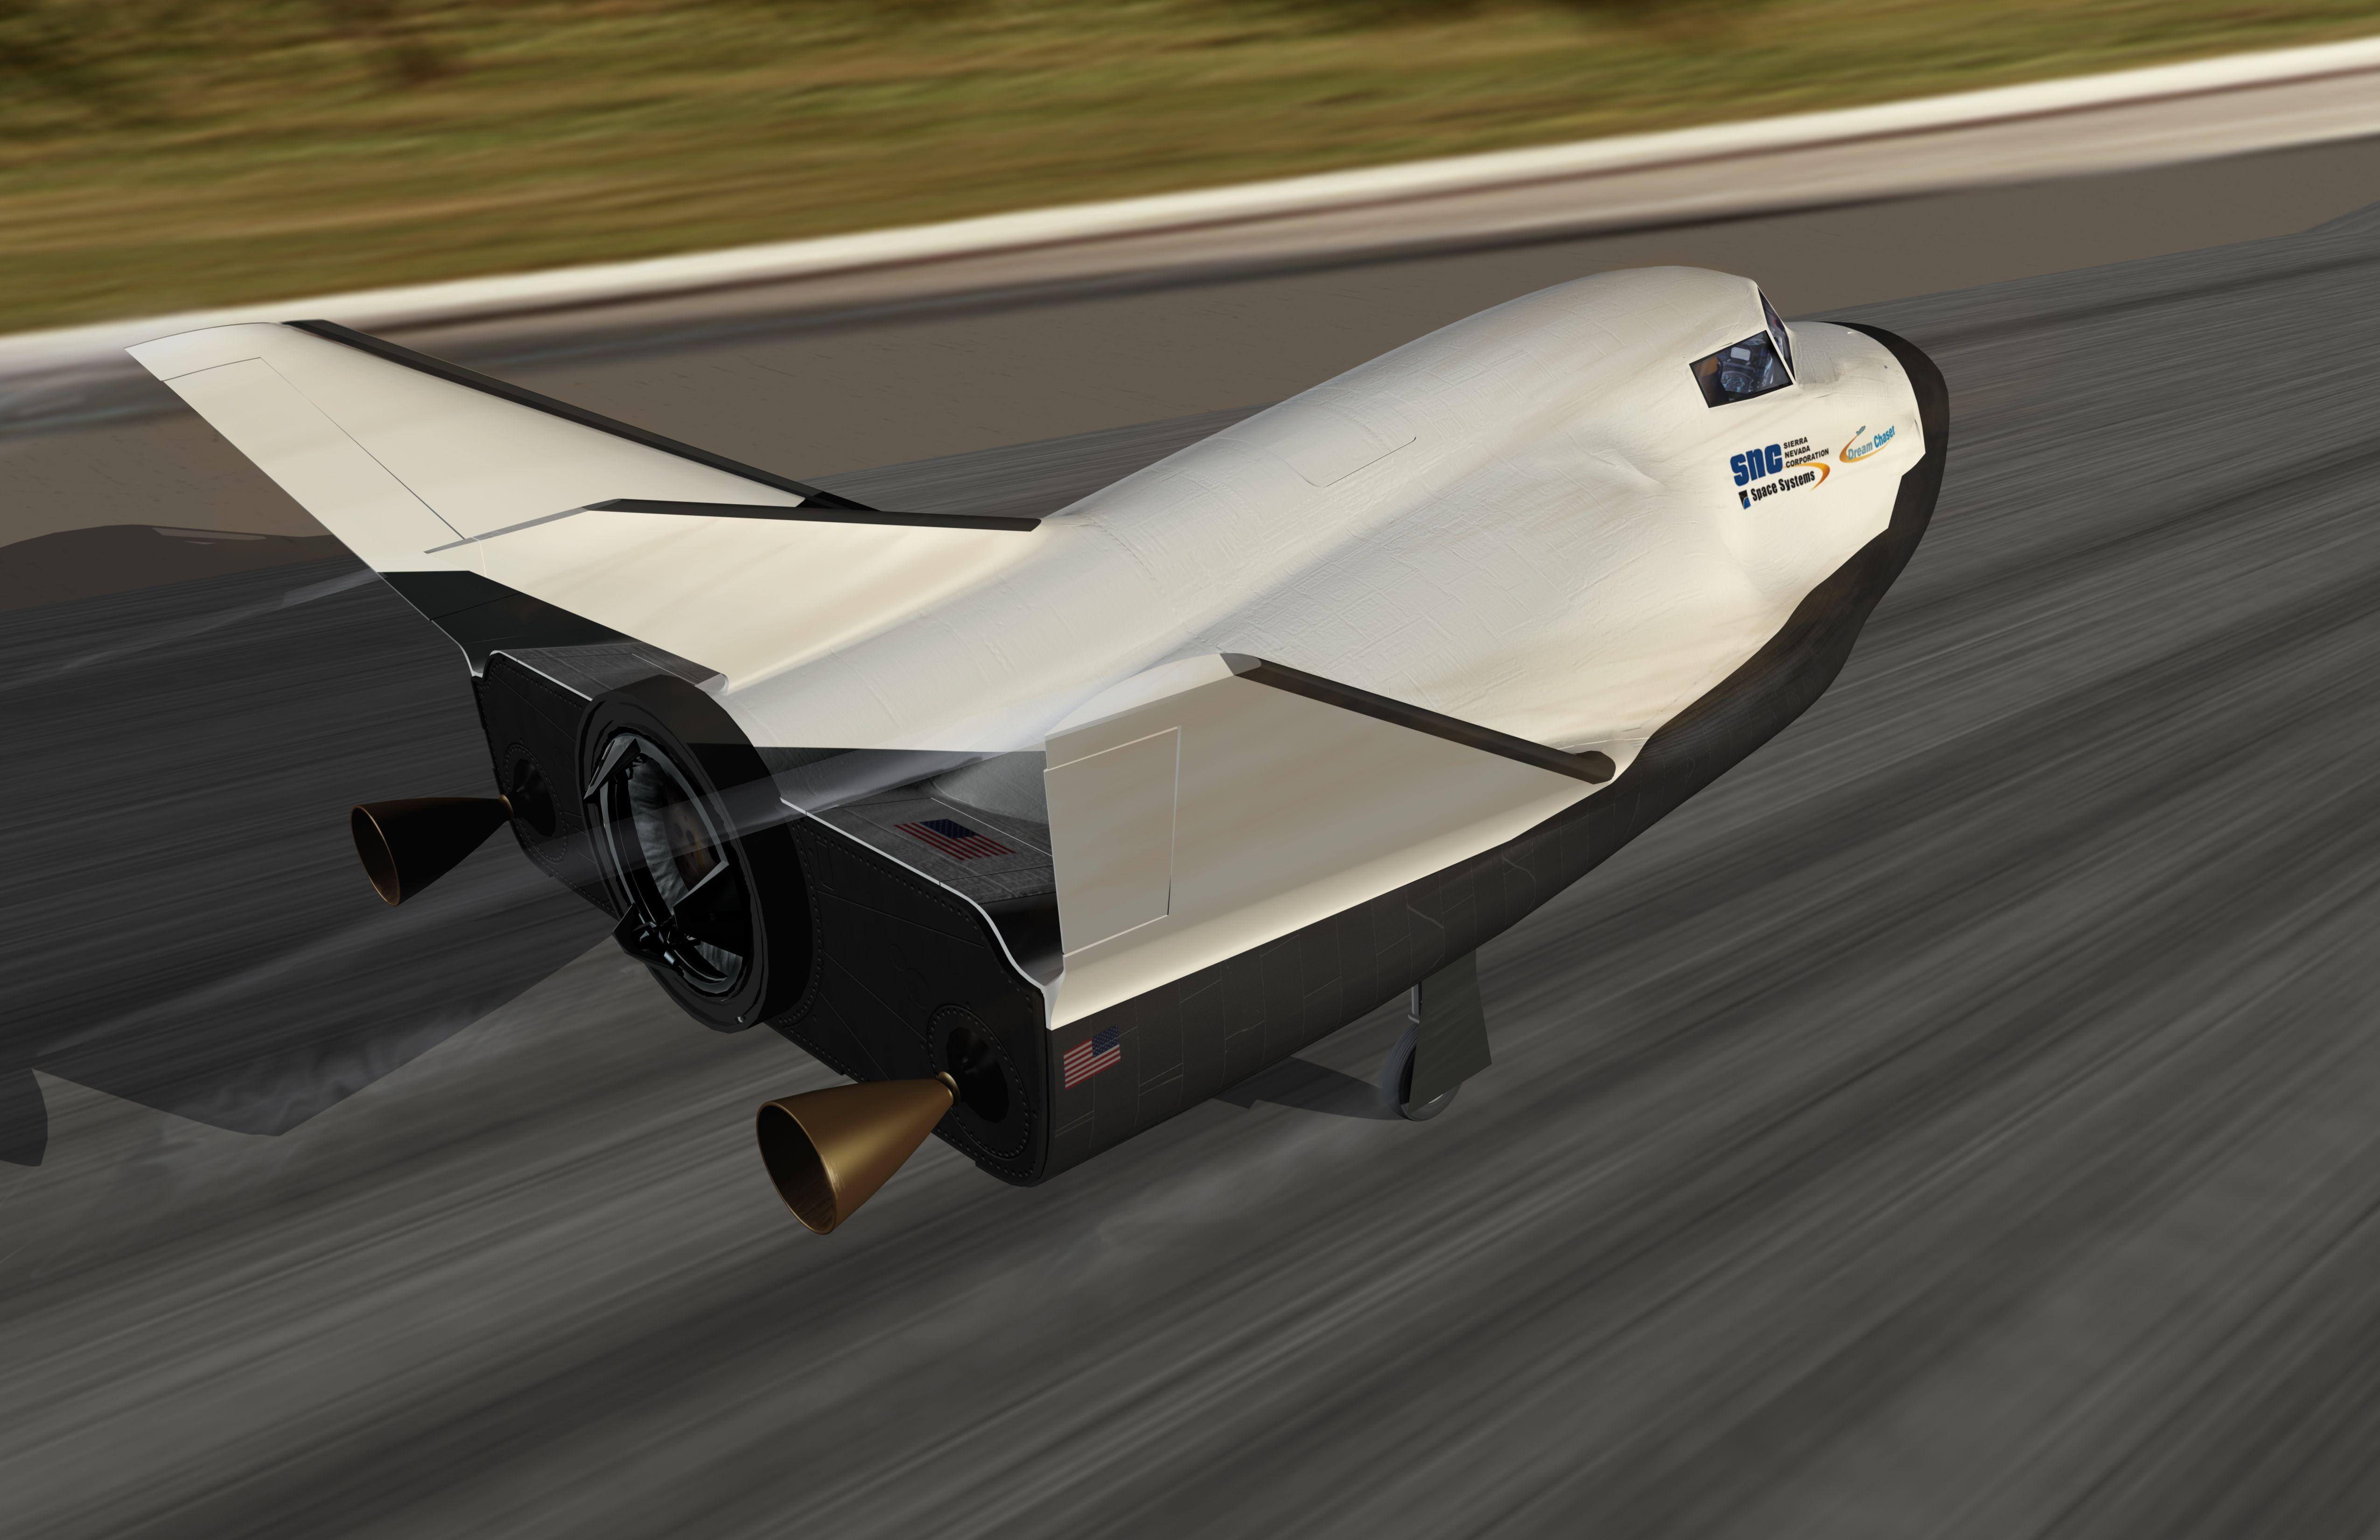 No more Space Shuttle? No problem. Spacecraft, Dream